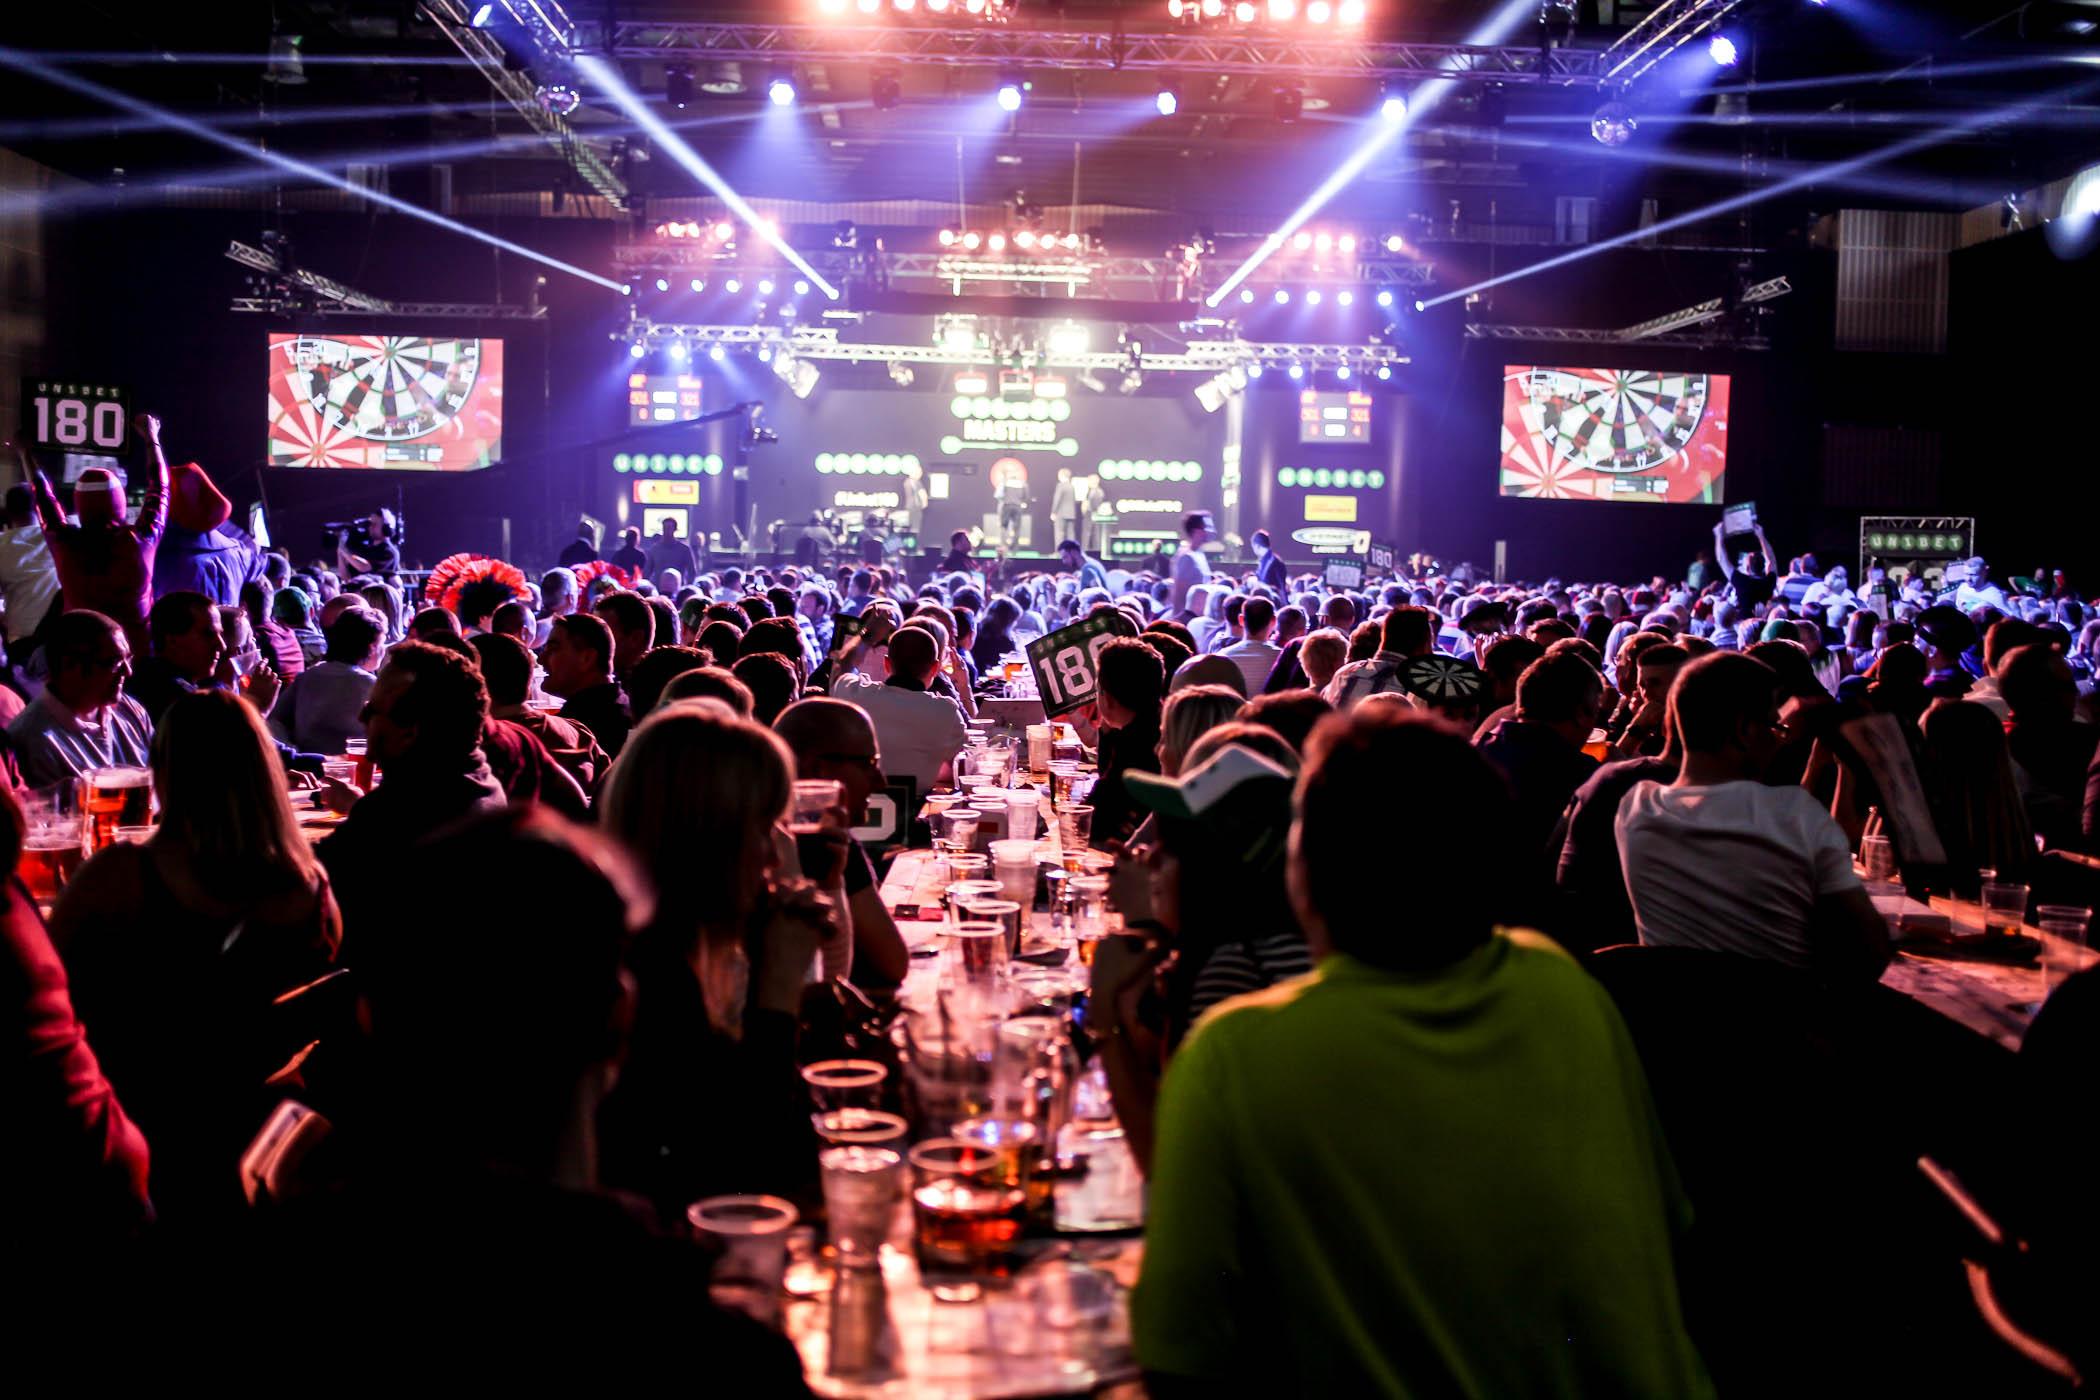 Stadium MK - Milton Keynes Conference, Meetings and Events Venue